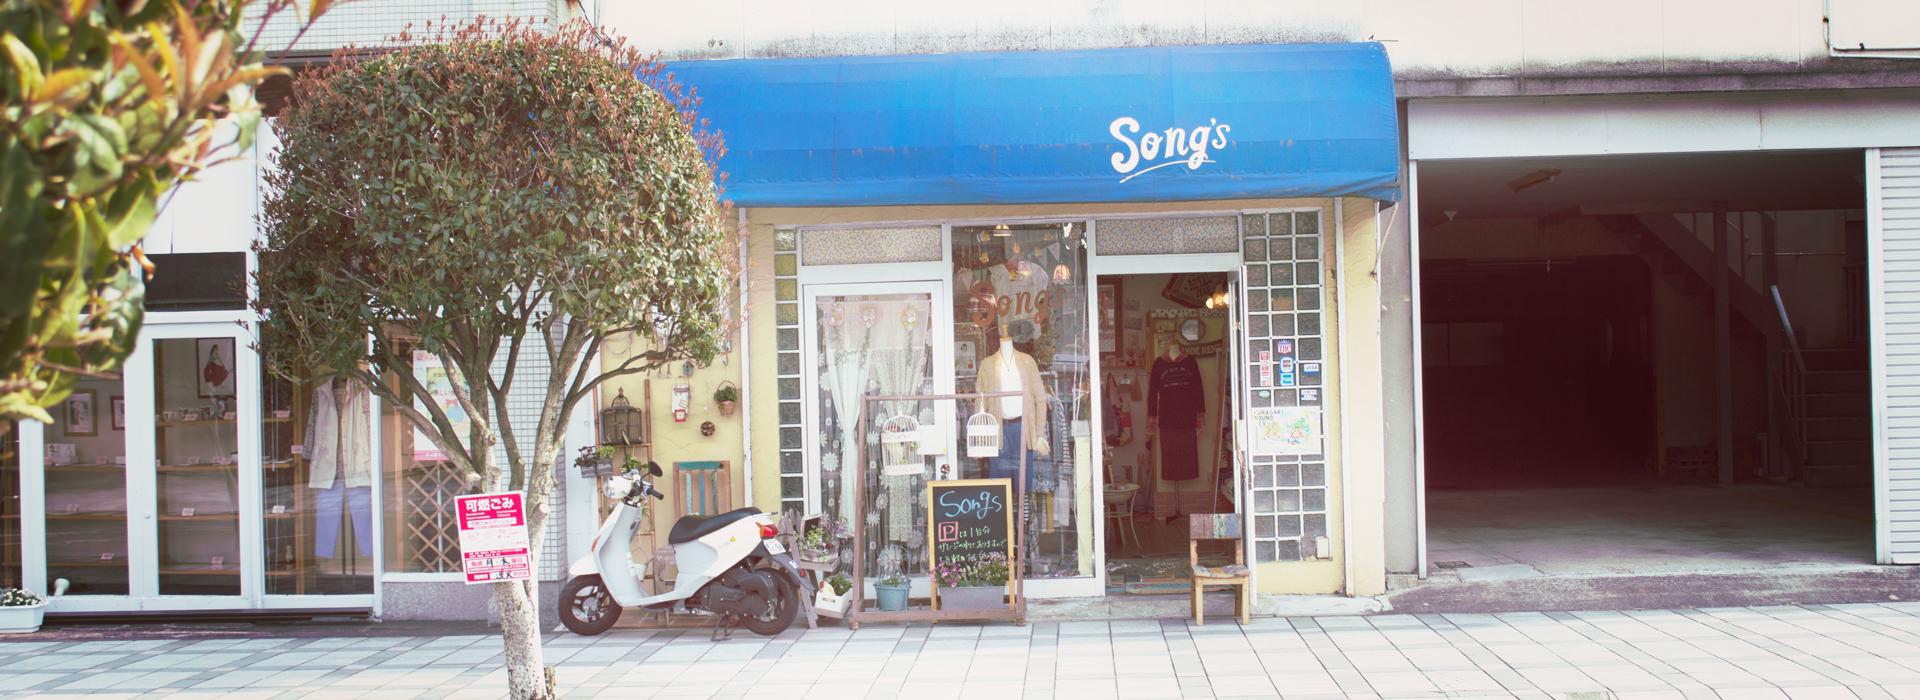 *Song's(ソングス)*愛知県岡崎市のレディースセレクトショップ JEAN NASSAUS,JOHNBULLなど取り扱い